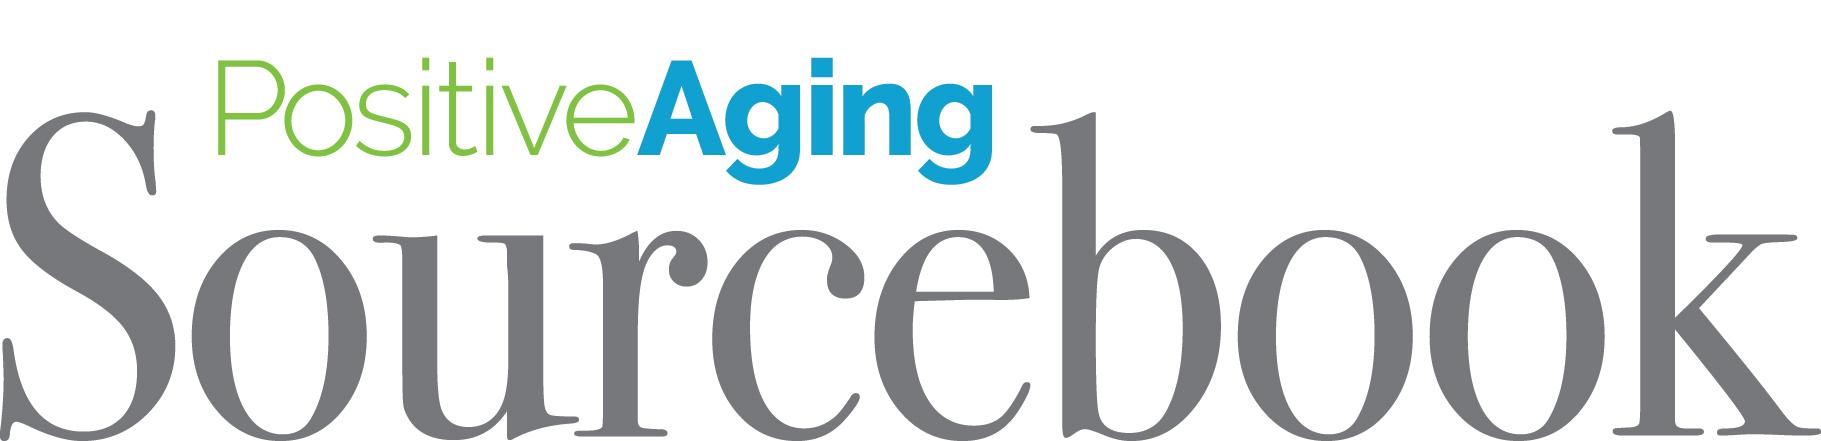 Positive Aging Sourcebook